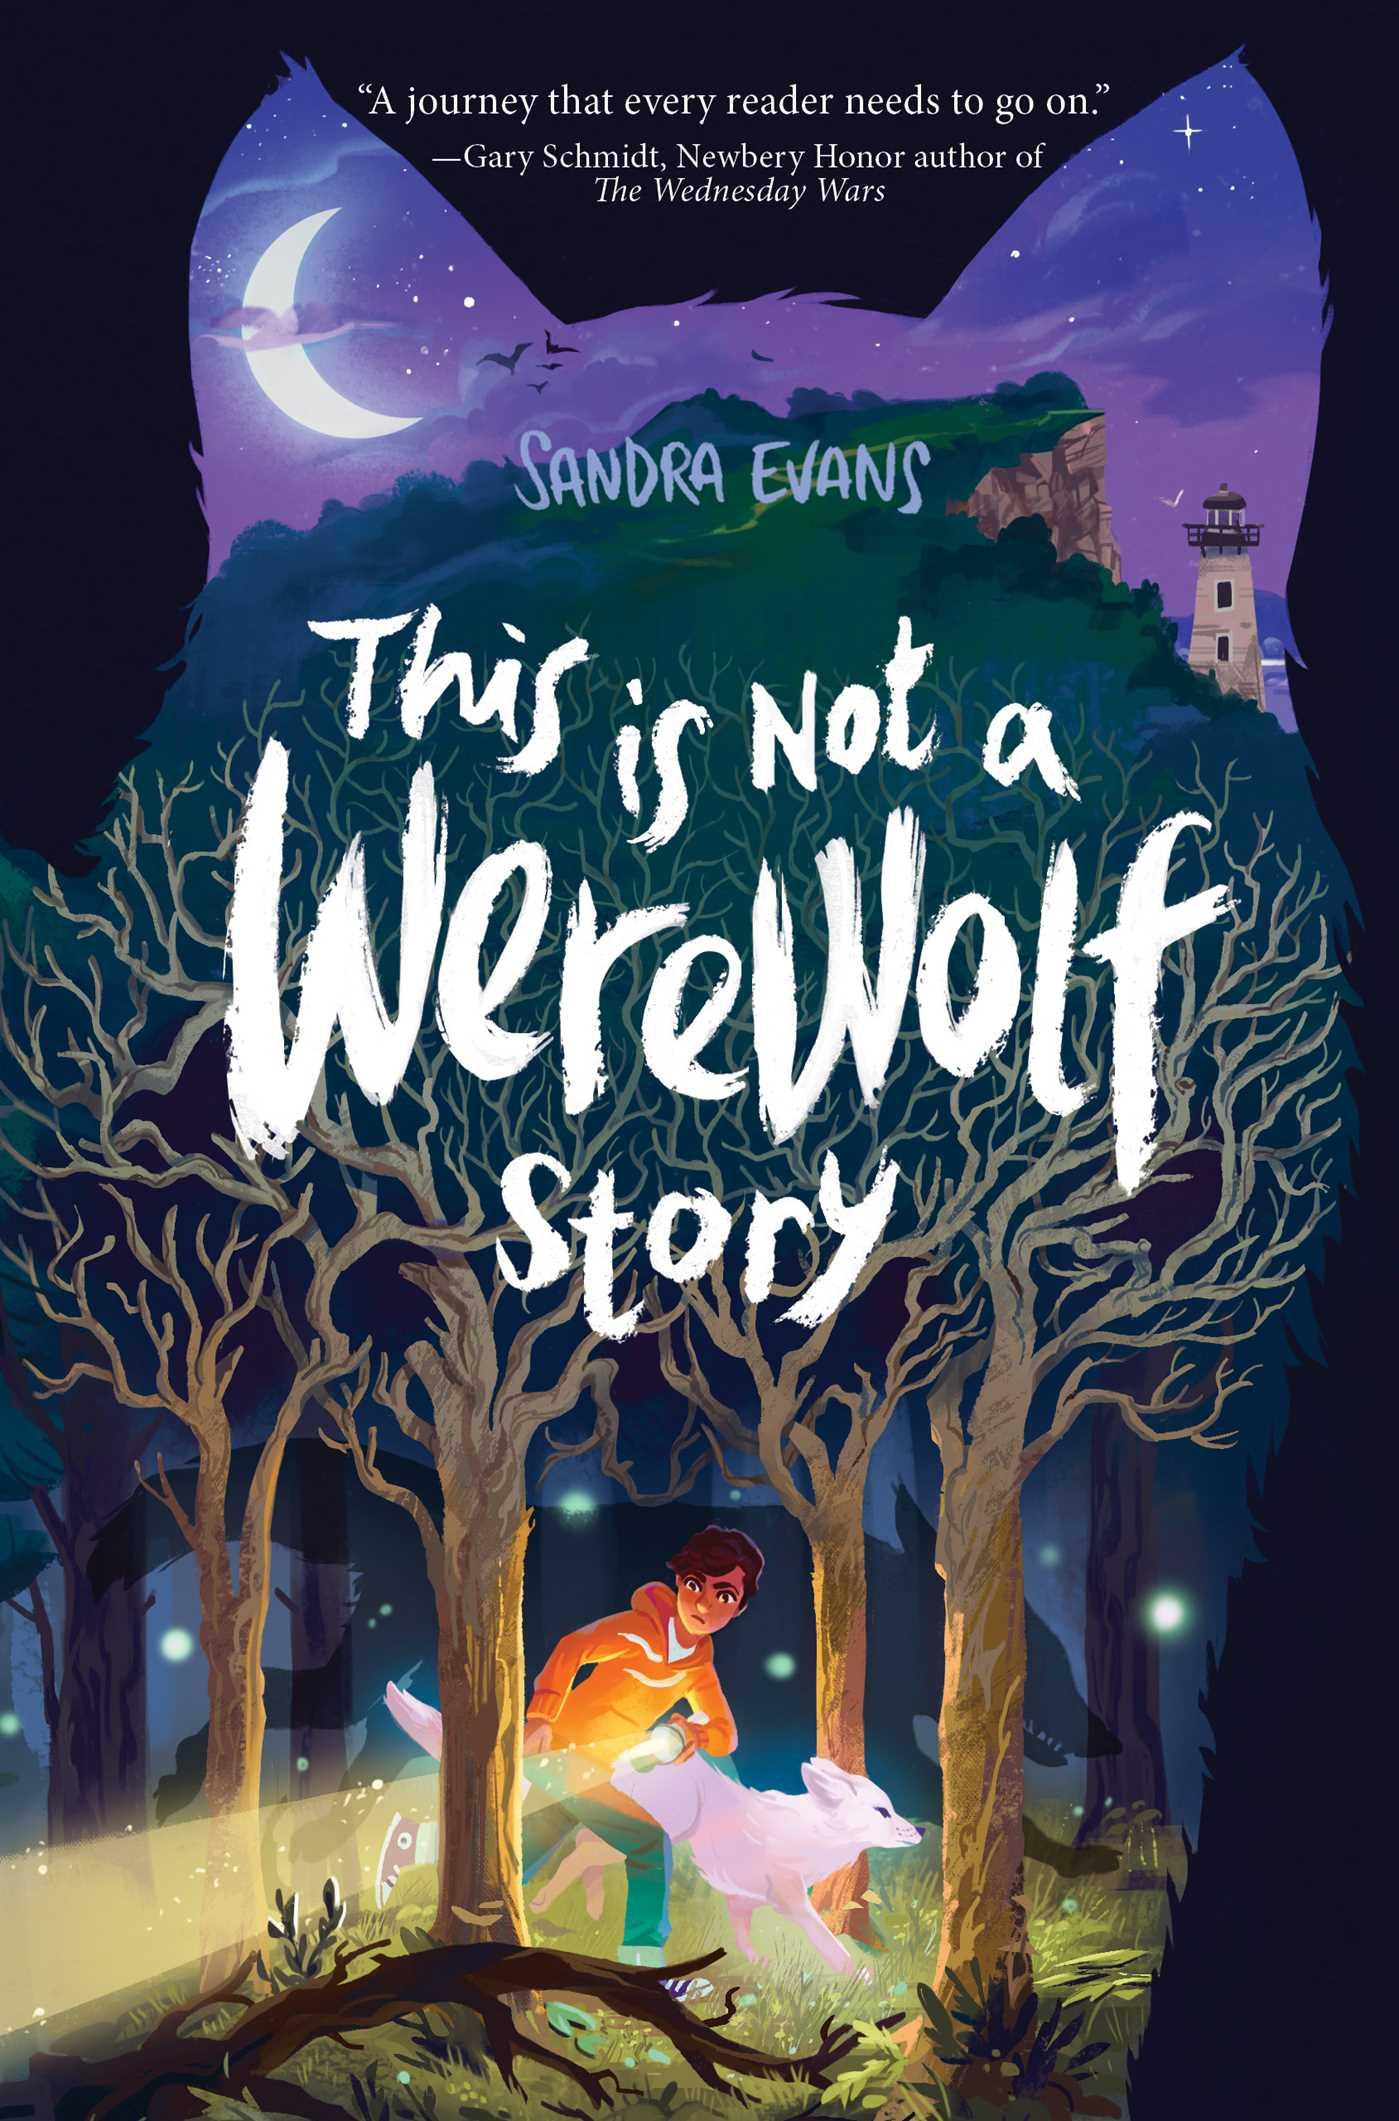 Did Free werewolf erotica tell